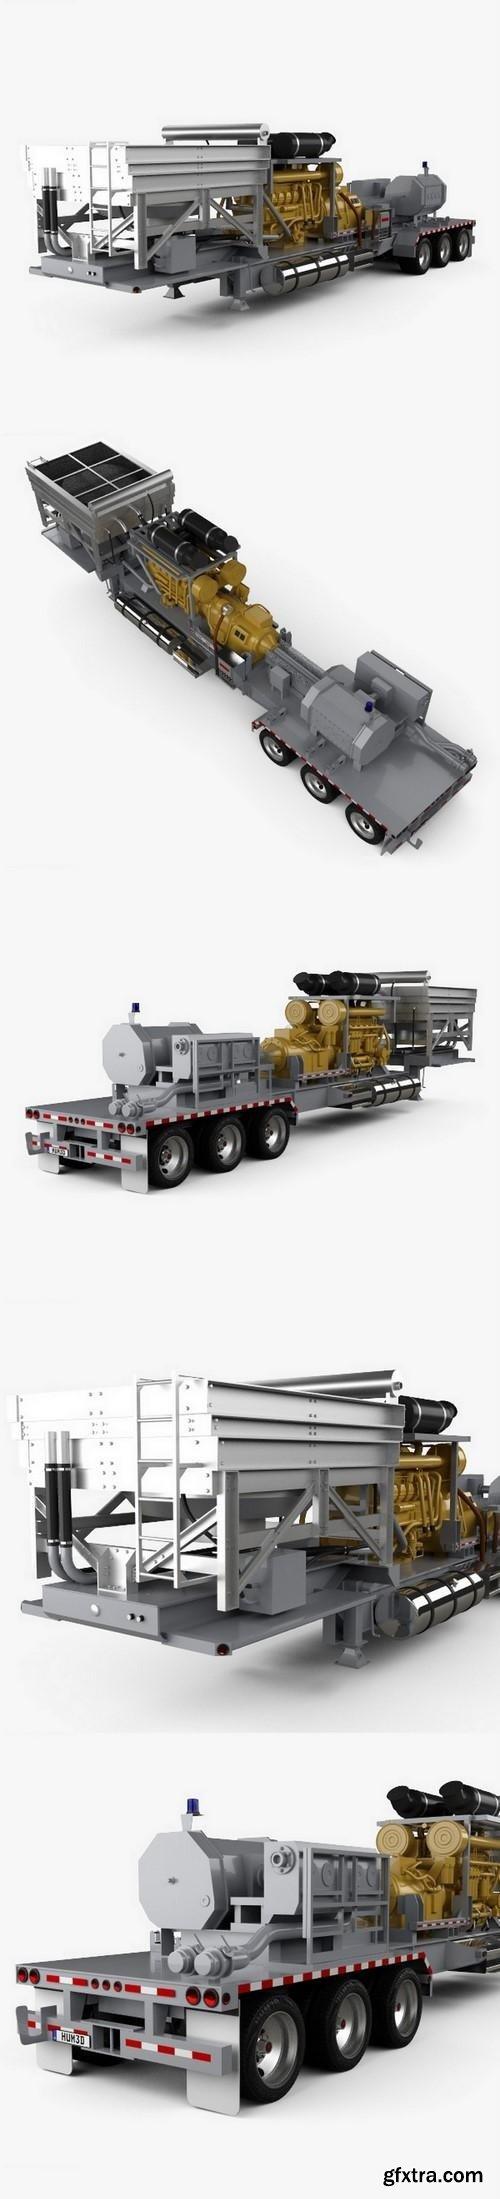 Trailer Semi Caterpillar Fracturing Unit 2018 3D Model